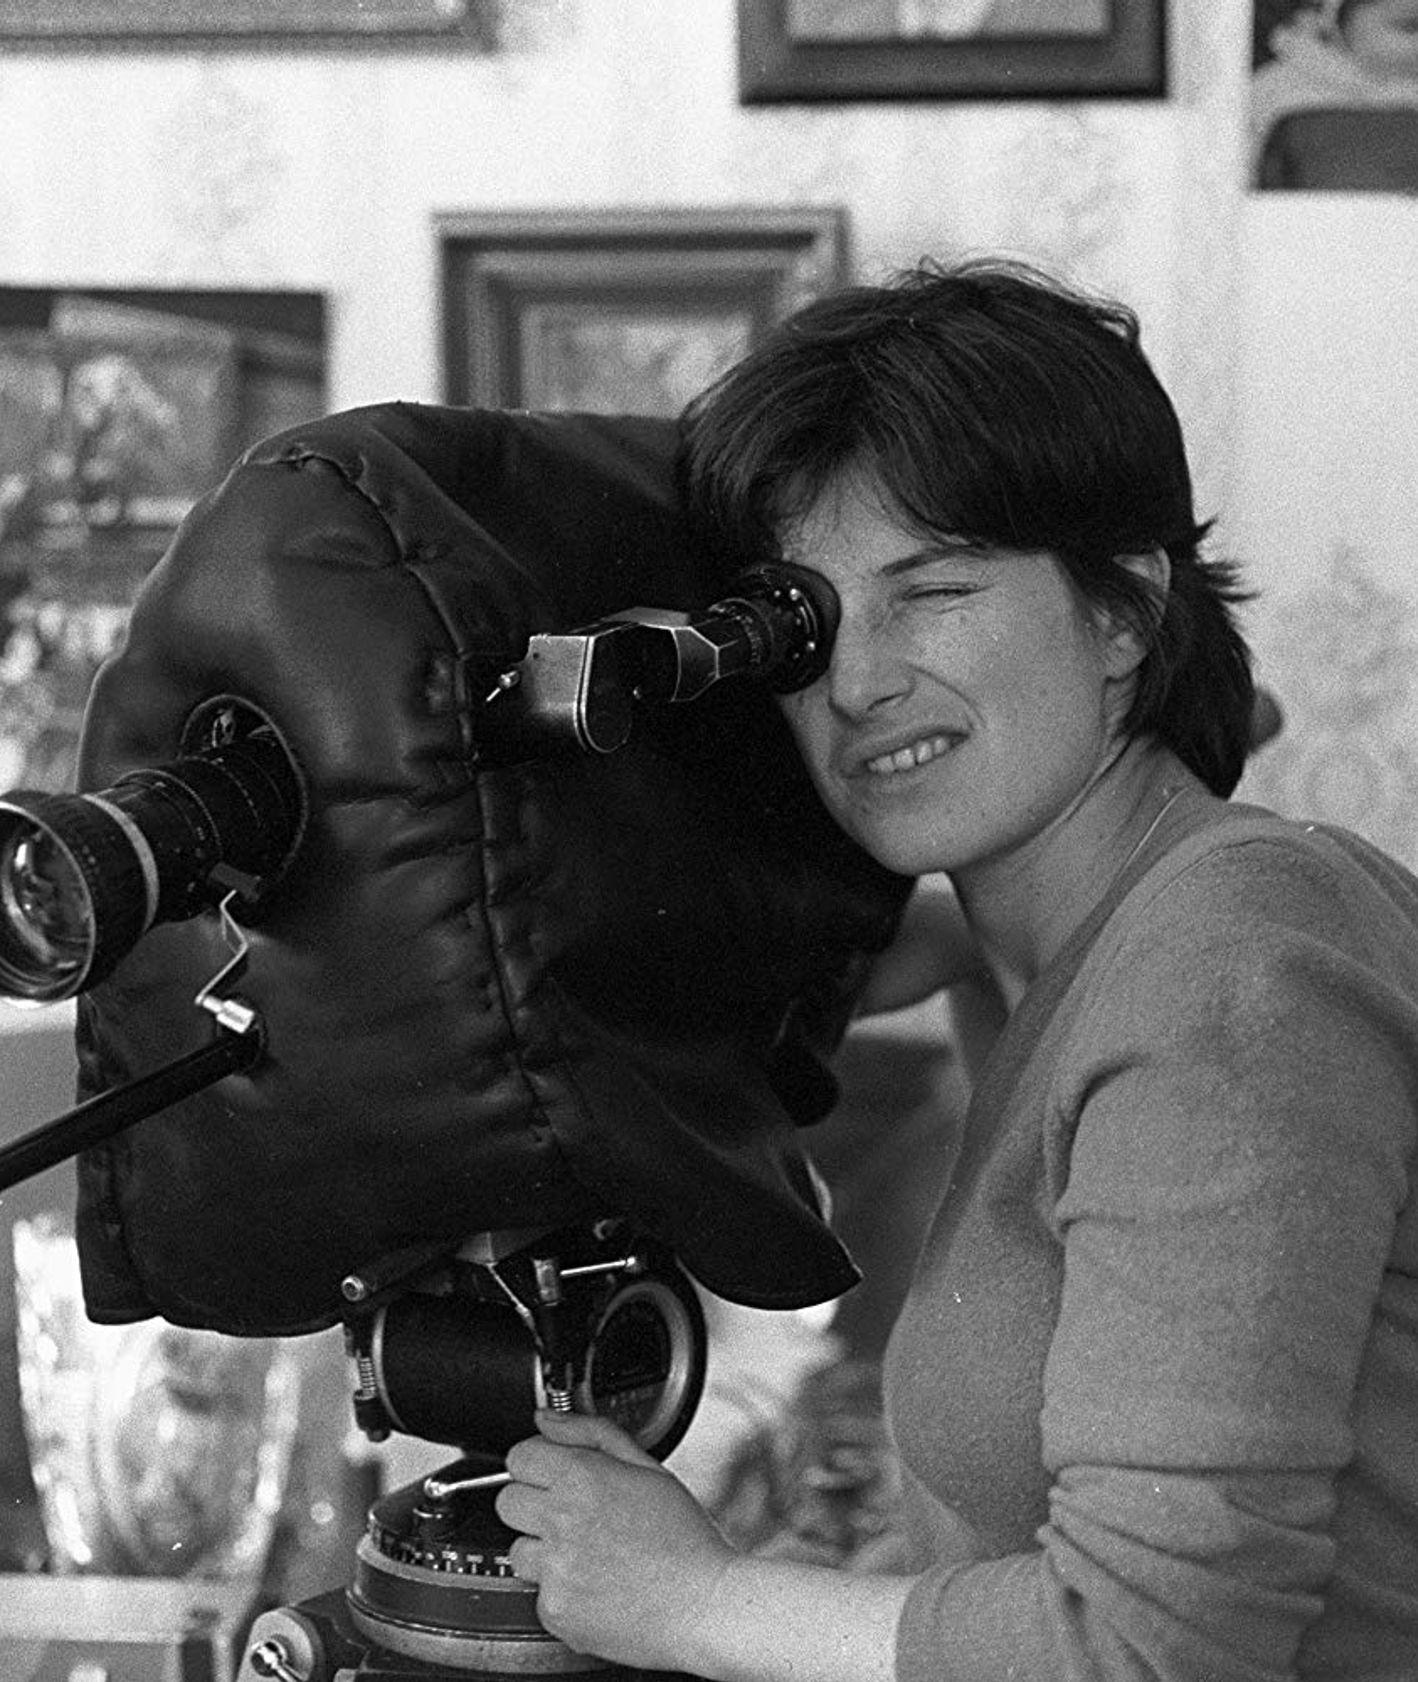 Reżyserka Chantal Akerman za kamerą (fot. materiały prasowe / IMDB)